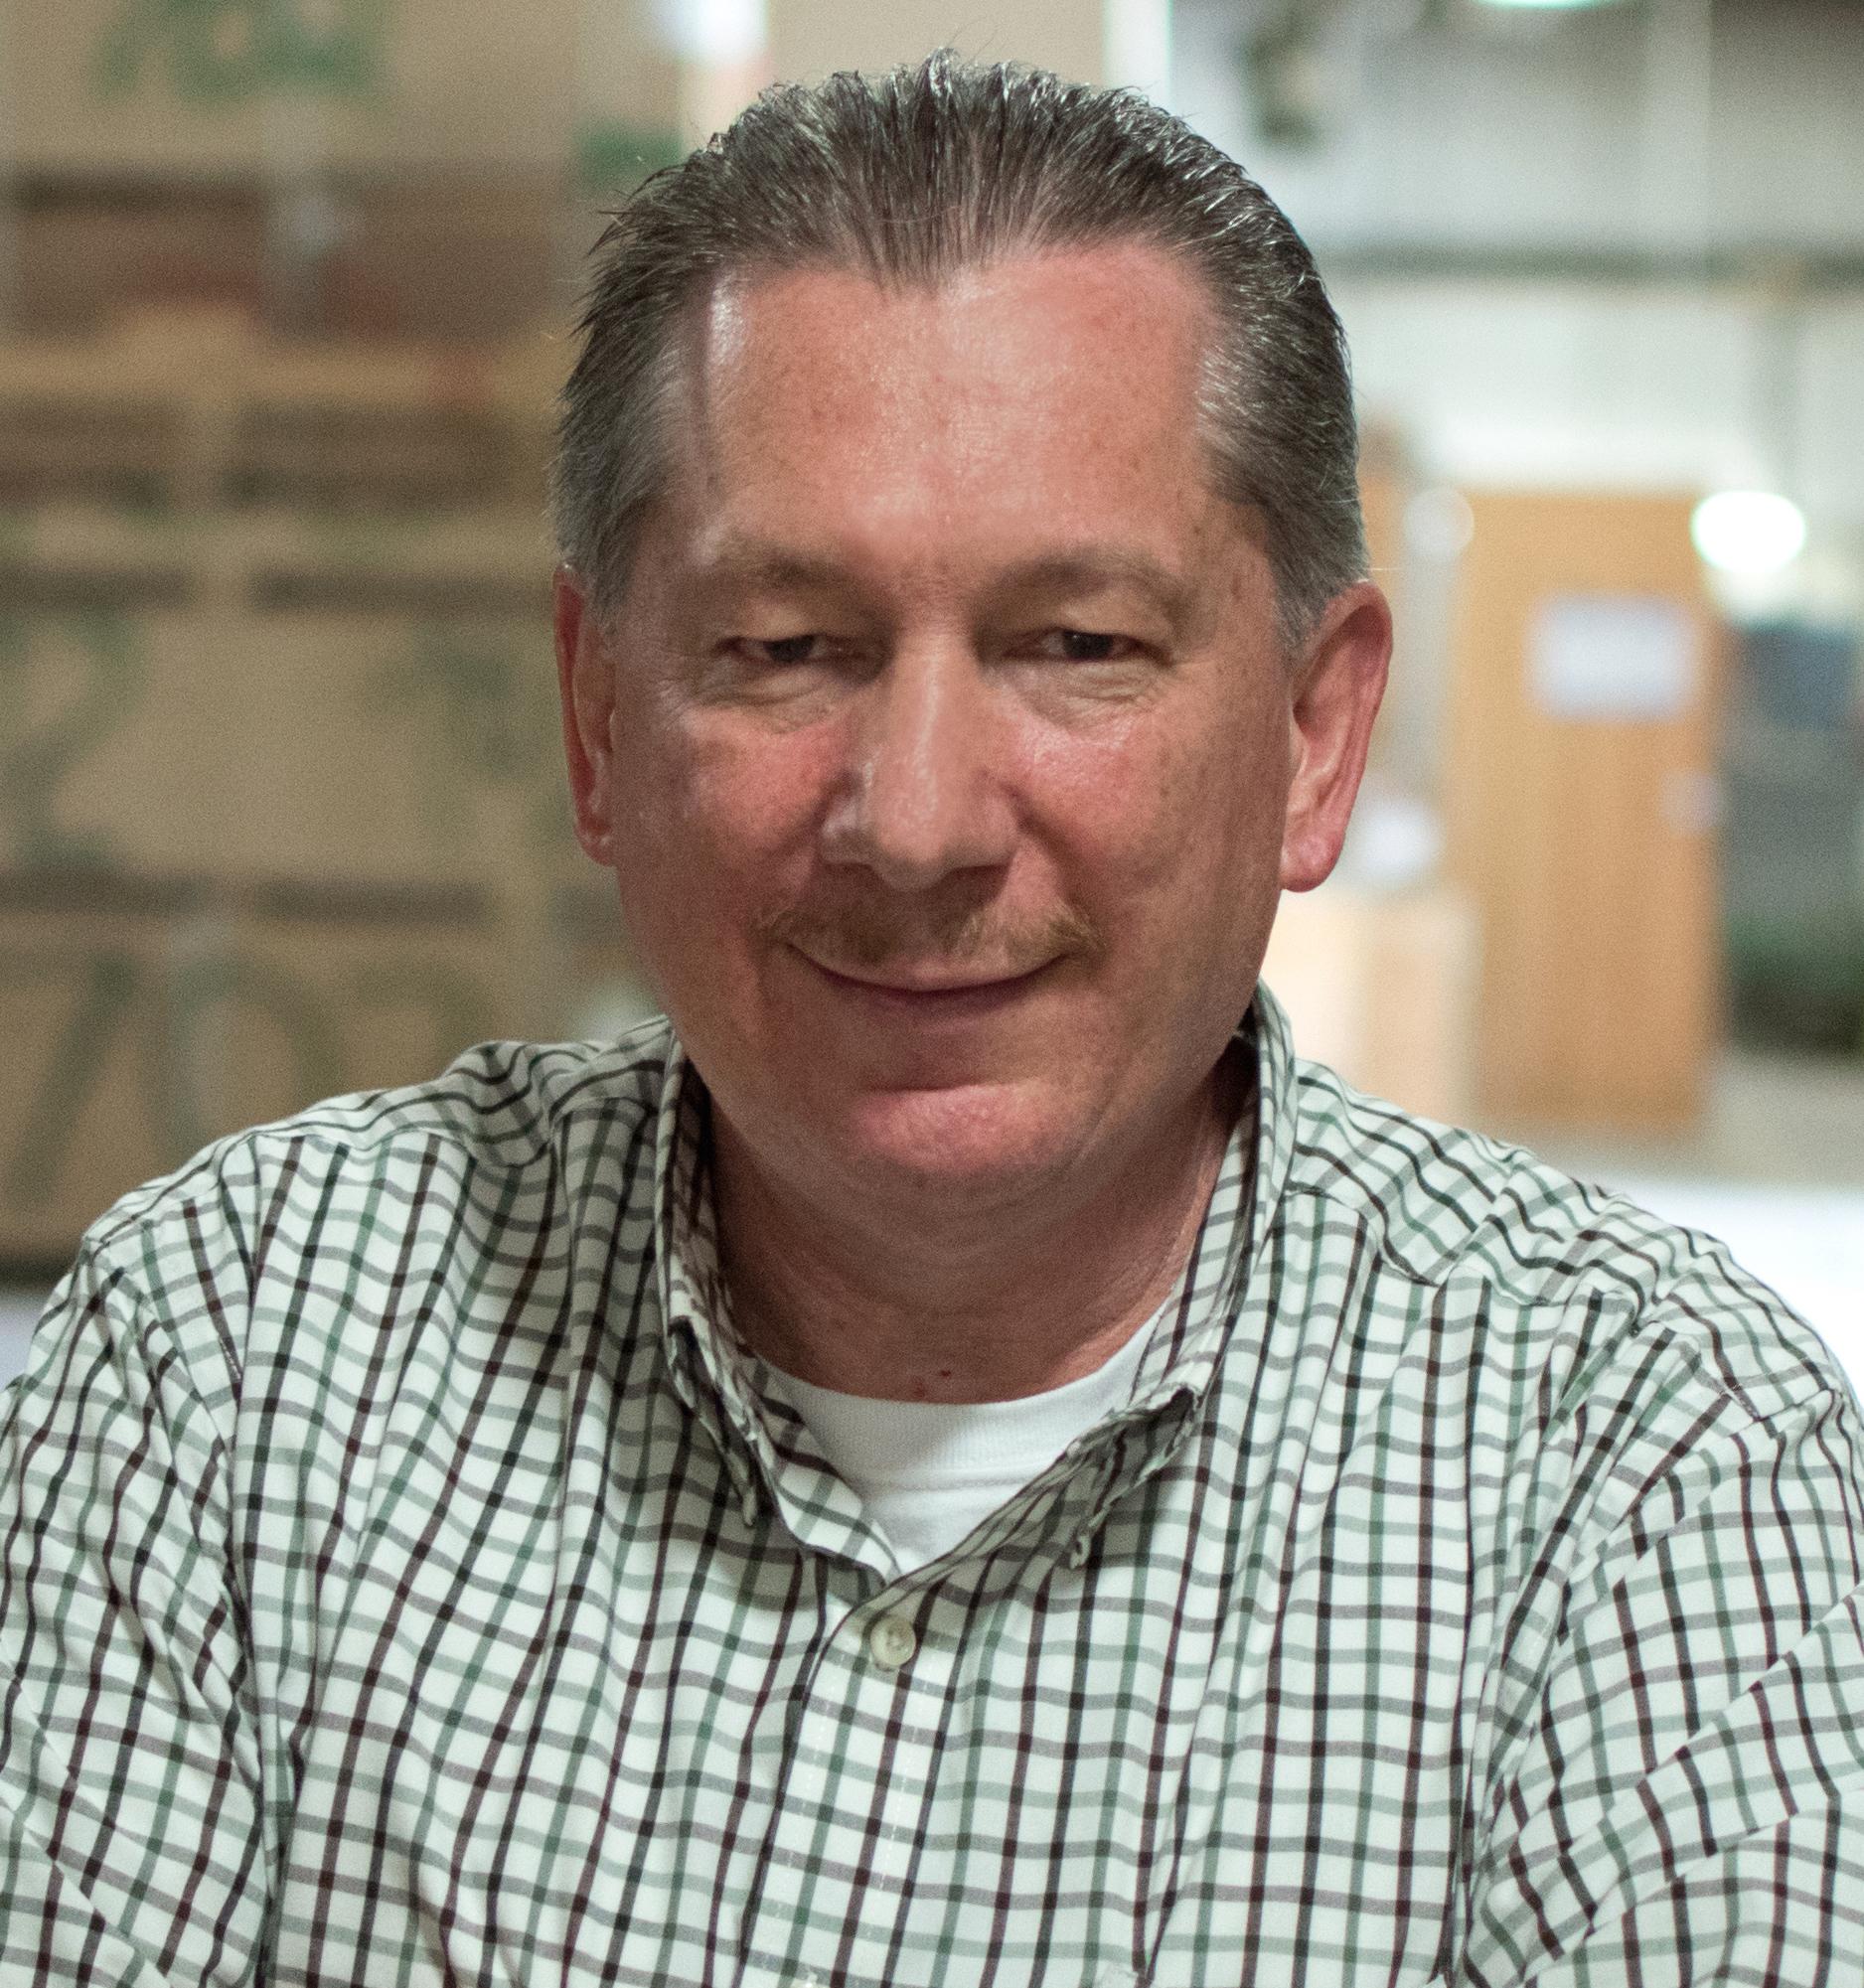 Oshkosh Door Welcomes Westemeier as Director of Operations  sc 1 st  Oshkosh Door Company & Oshkosh Door Welcomes Westemeier as Director of Operations | Oshkosh ...